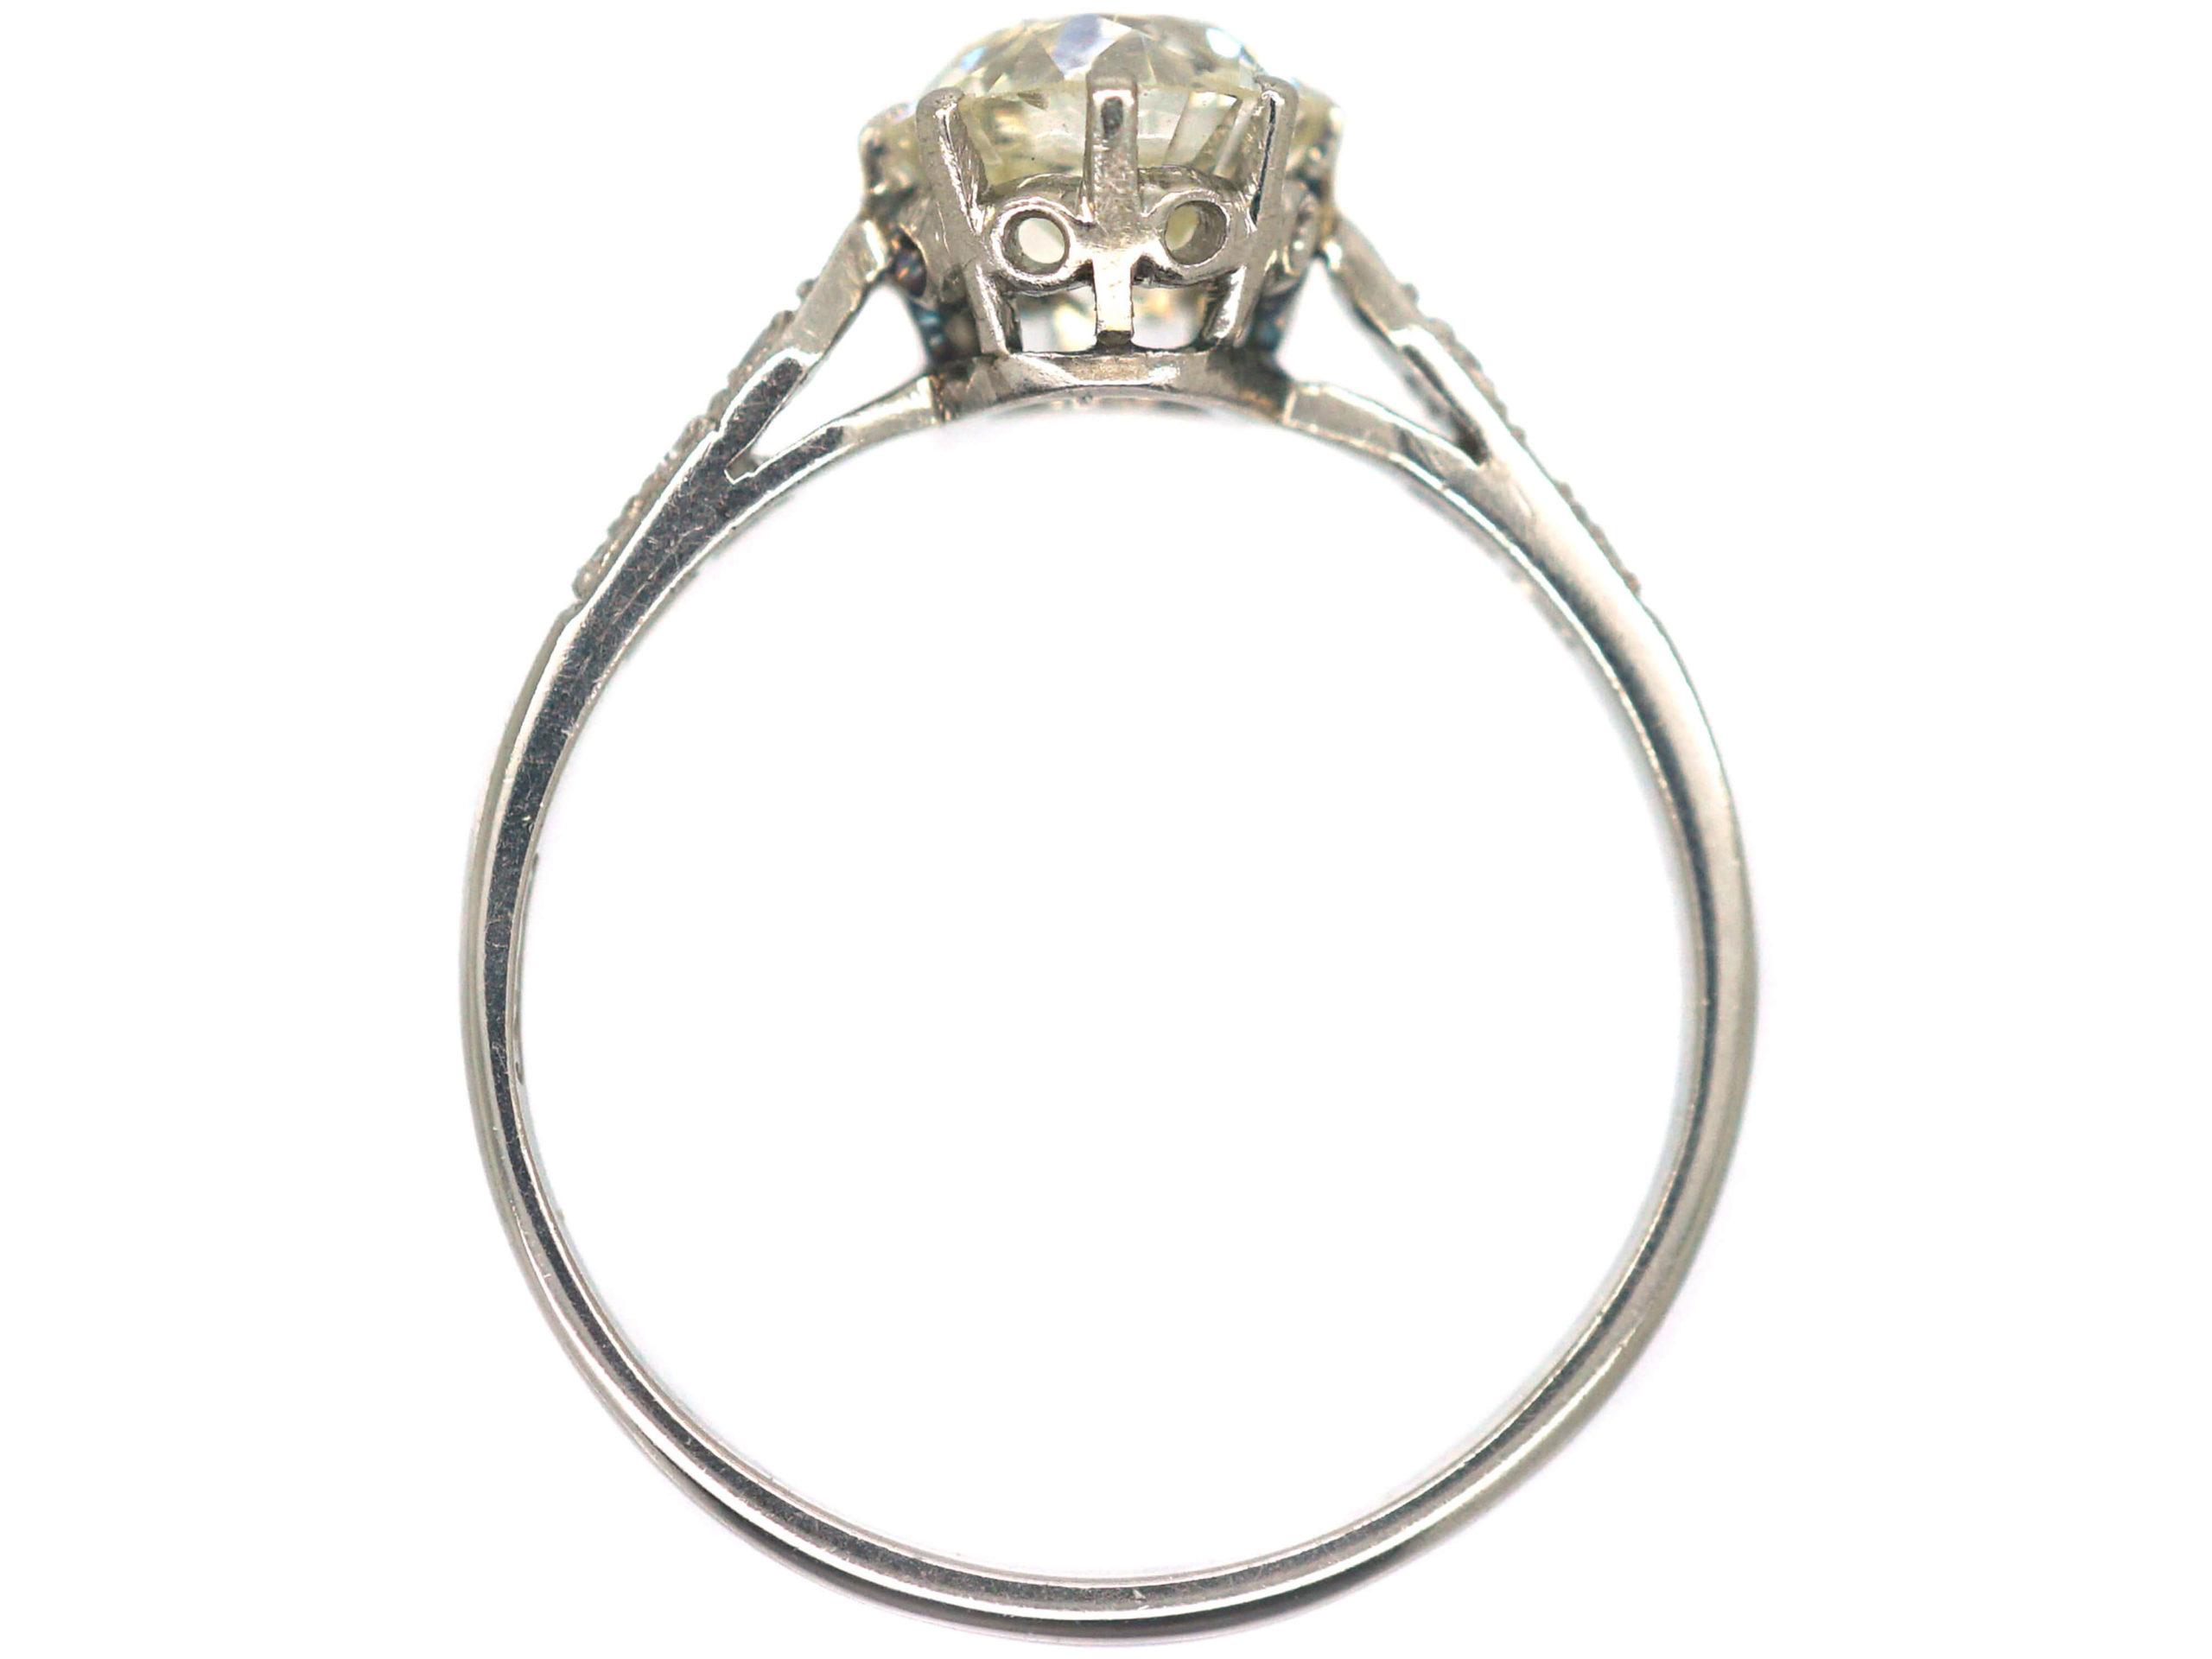 Art Deco Platinum, Diamond Solitaire Ring with Diamond Set Shoulders